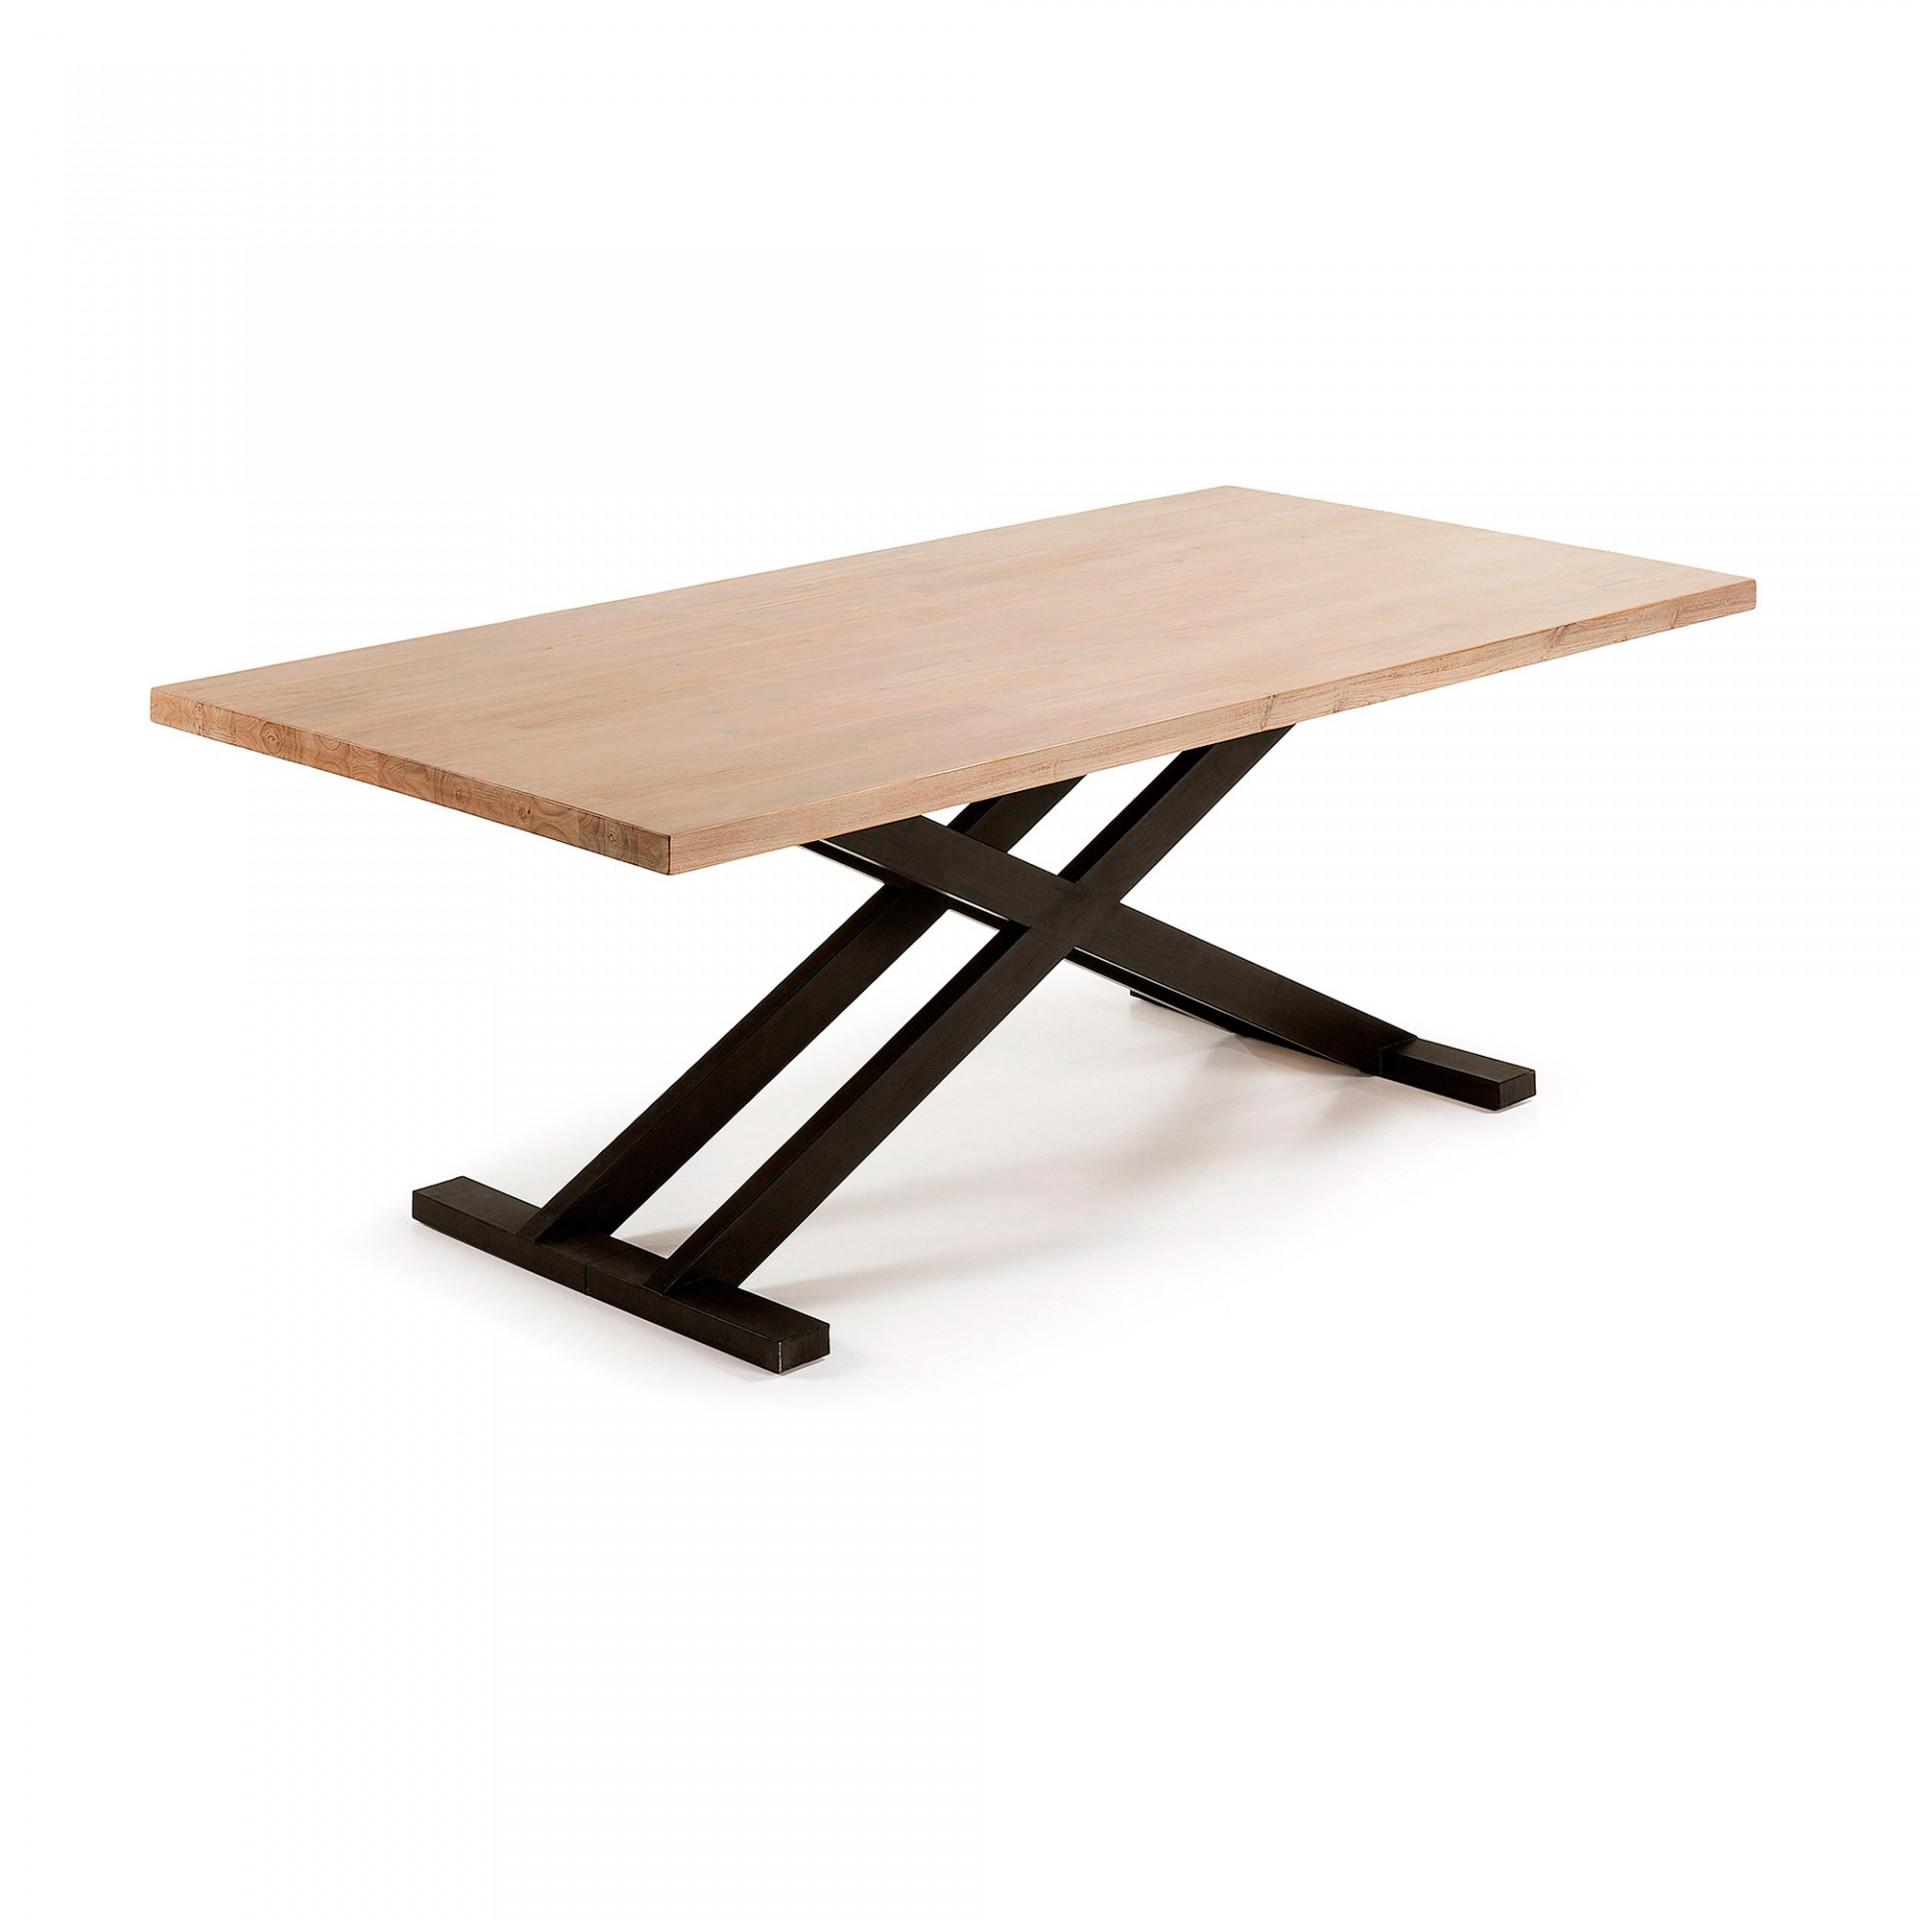 Mesa de jantar, metal/madeira de acácia natural, 160x90 cm